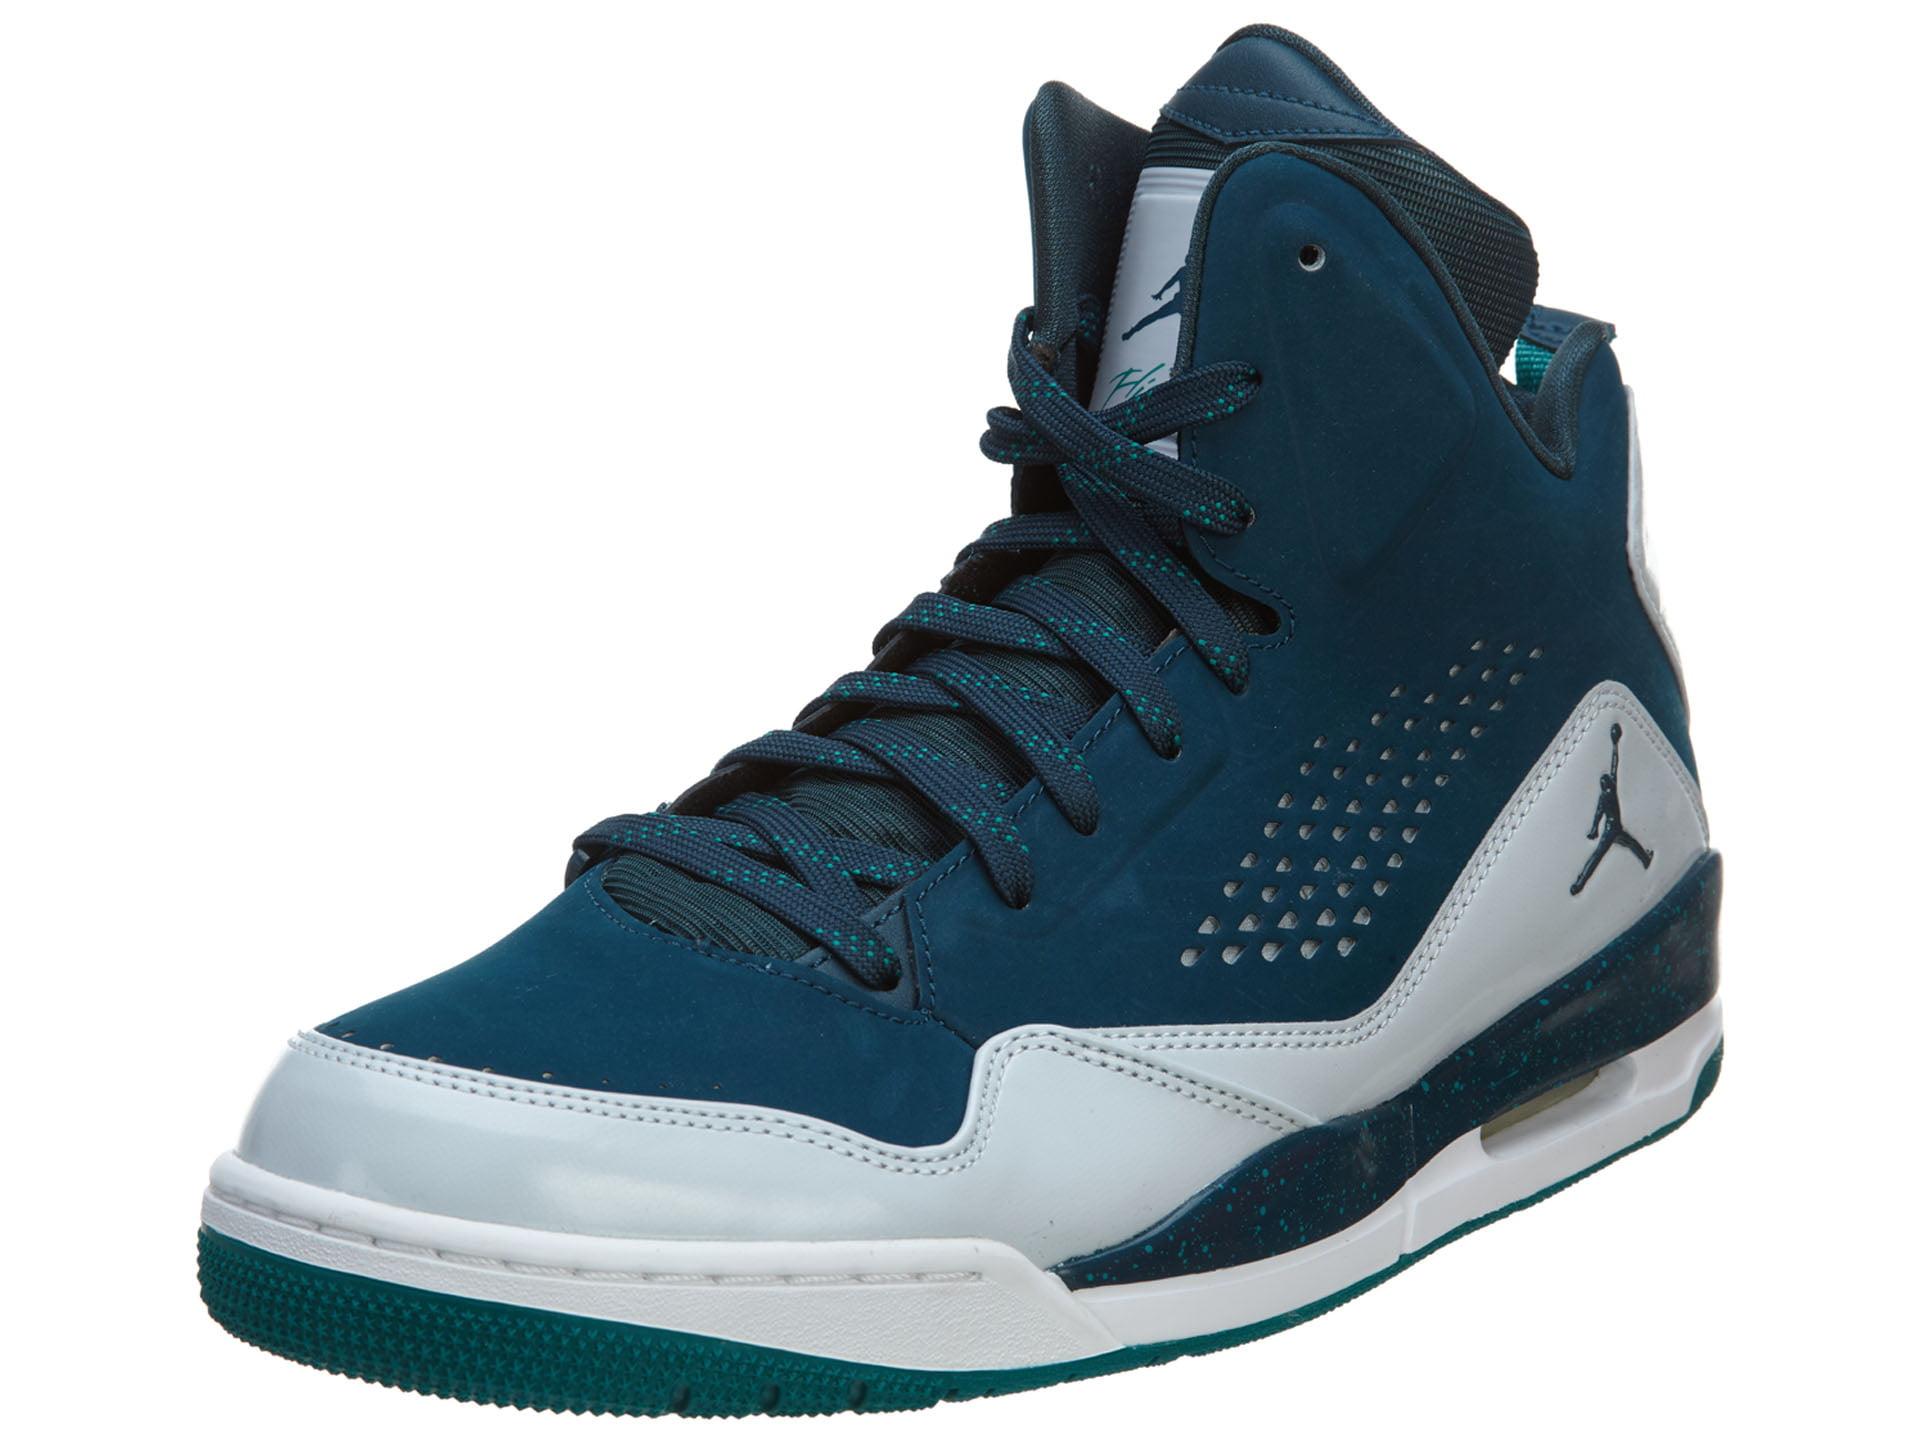 Nike Jordan Men's Jordan SC-3 Basketball Shoe